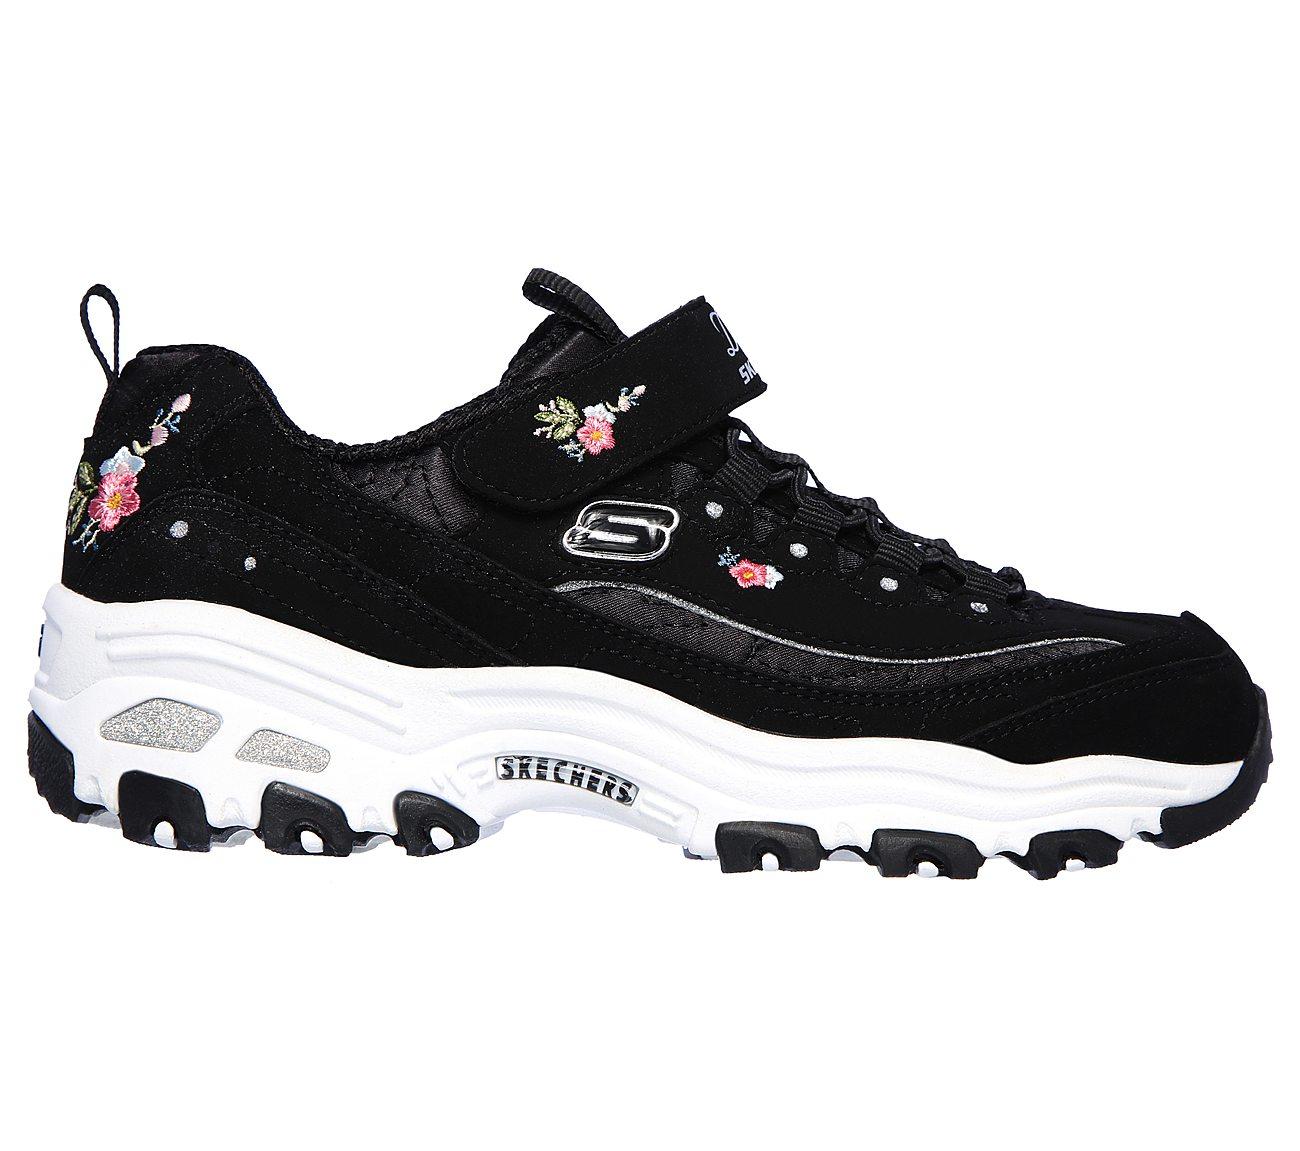 Lil Blossom Skechers D'Lites Shoes